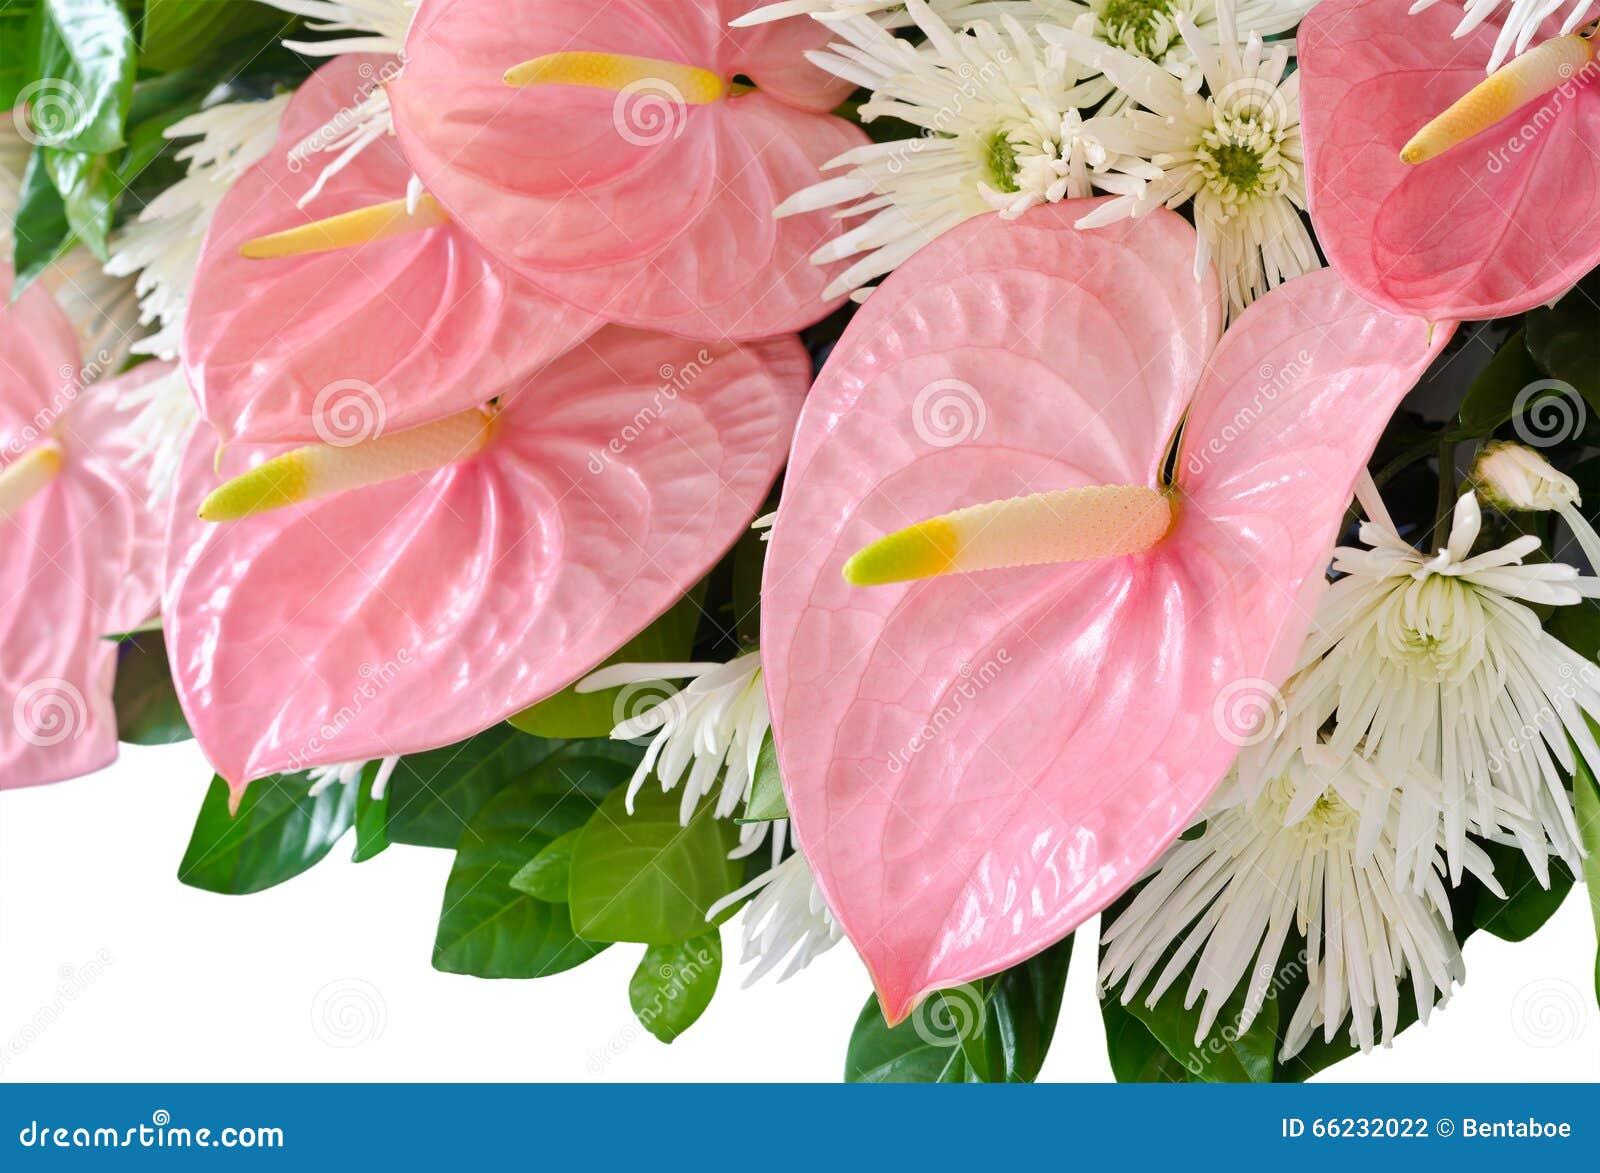 Pink Anthurium Flower Flamingo Flowers Stock Photo 66232022 Megapixl